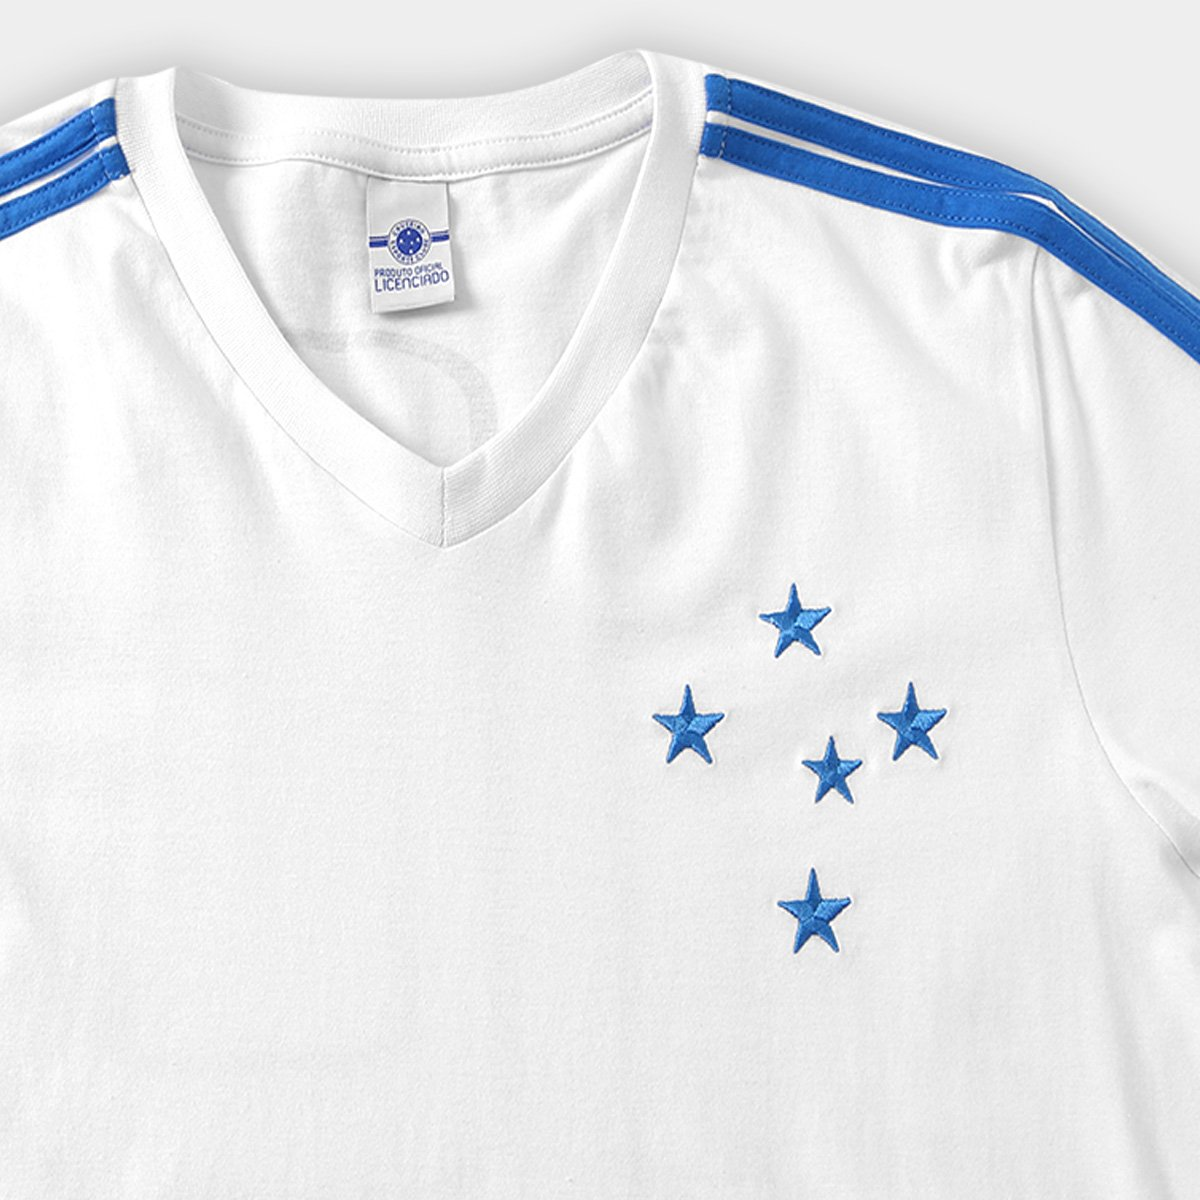 Camisa Cruzeiro Retro 1987 Natural - Masculino